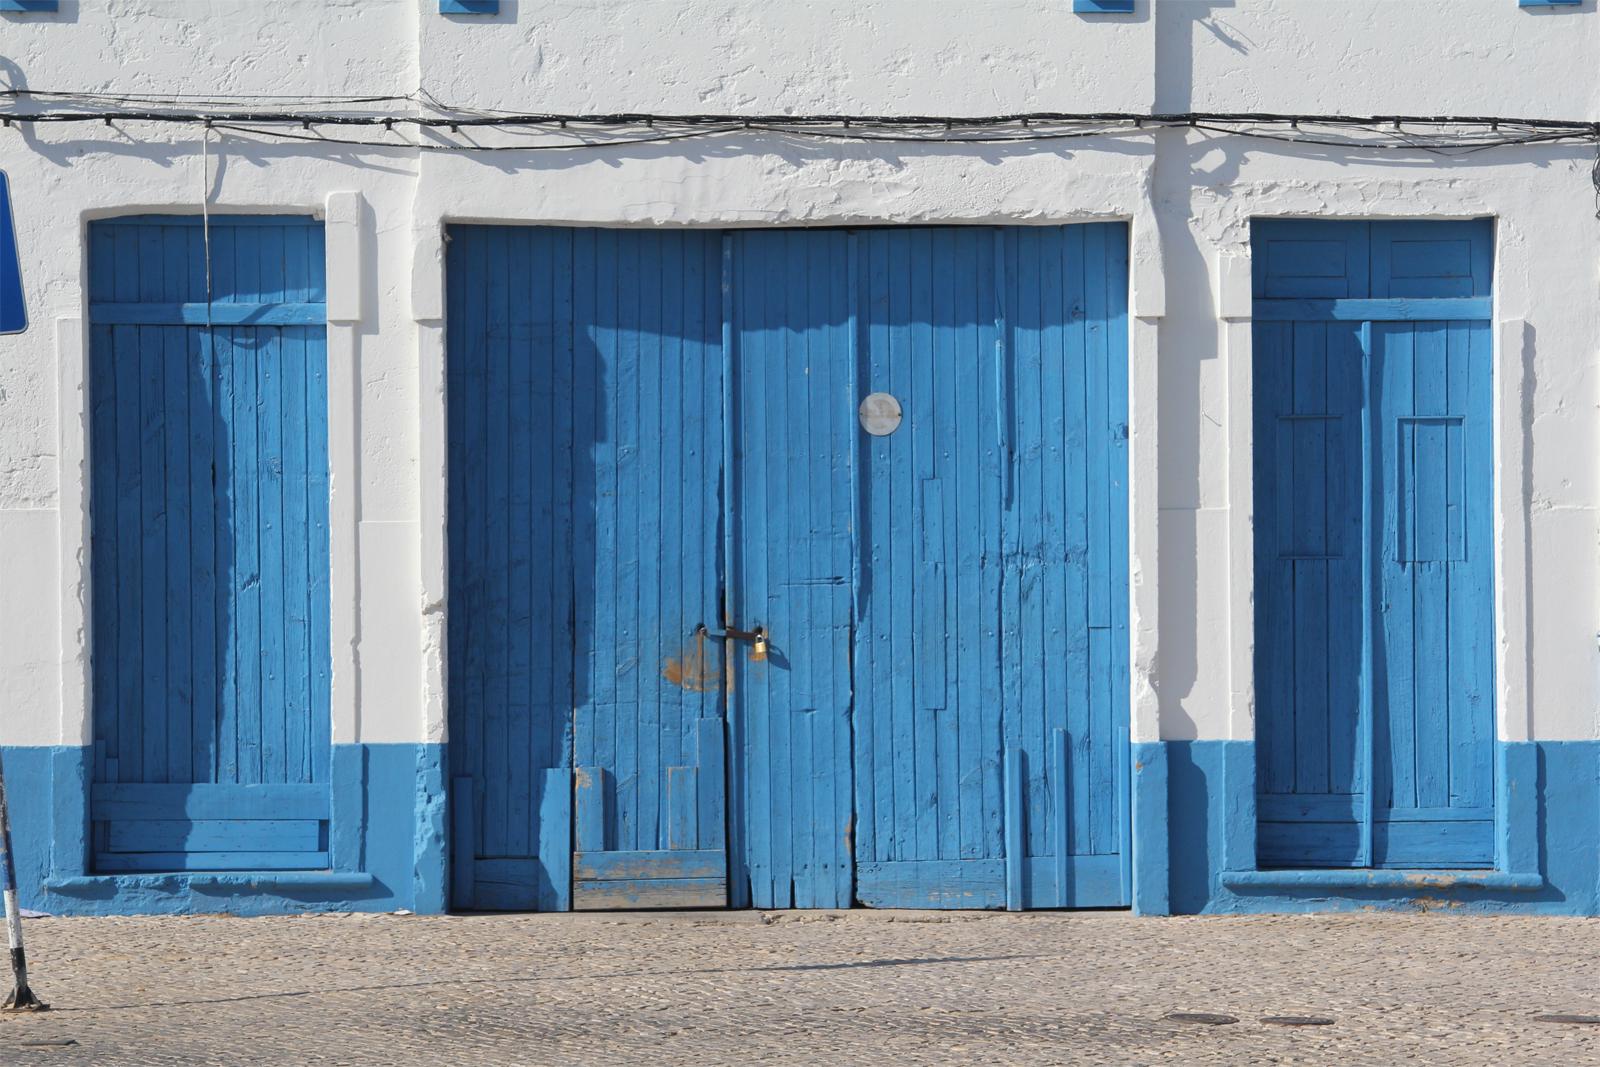 """The Blue Doors in Olhão"""